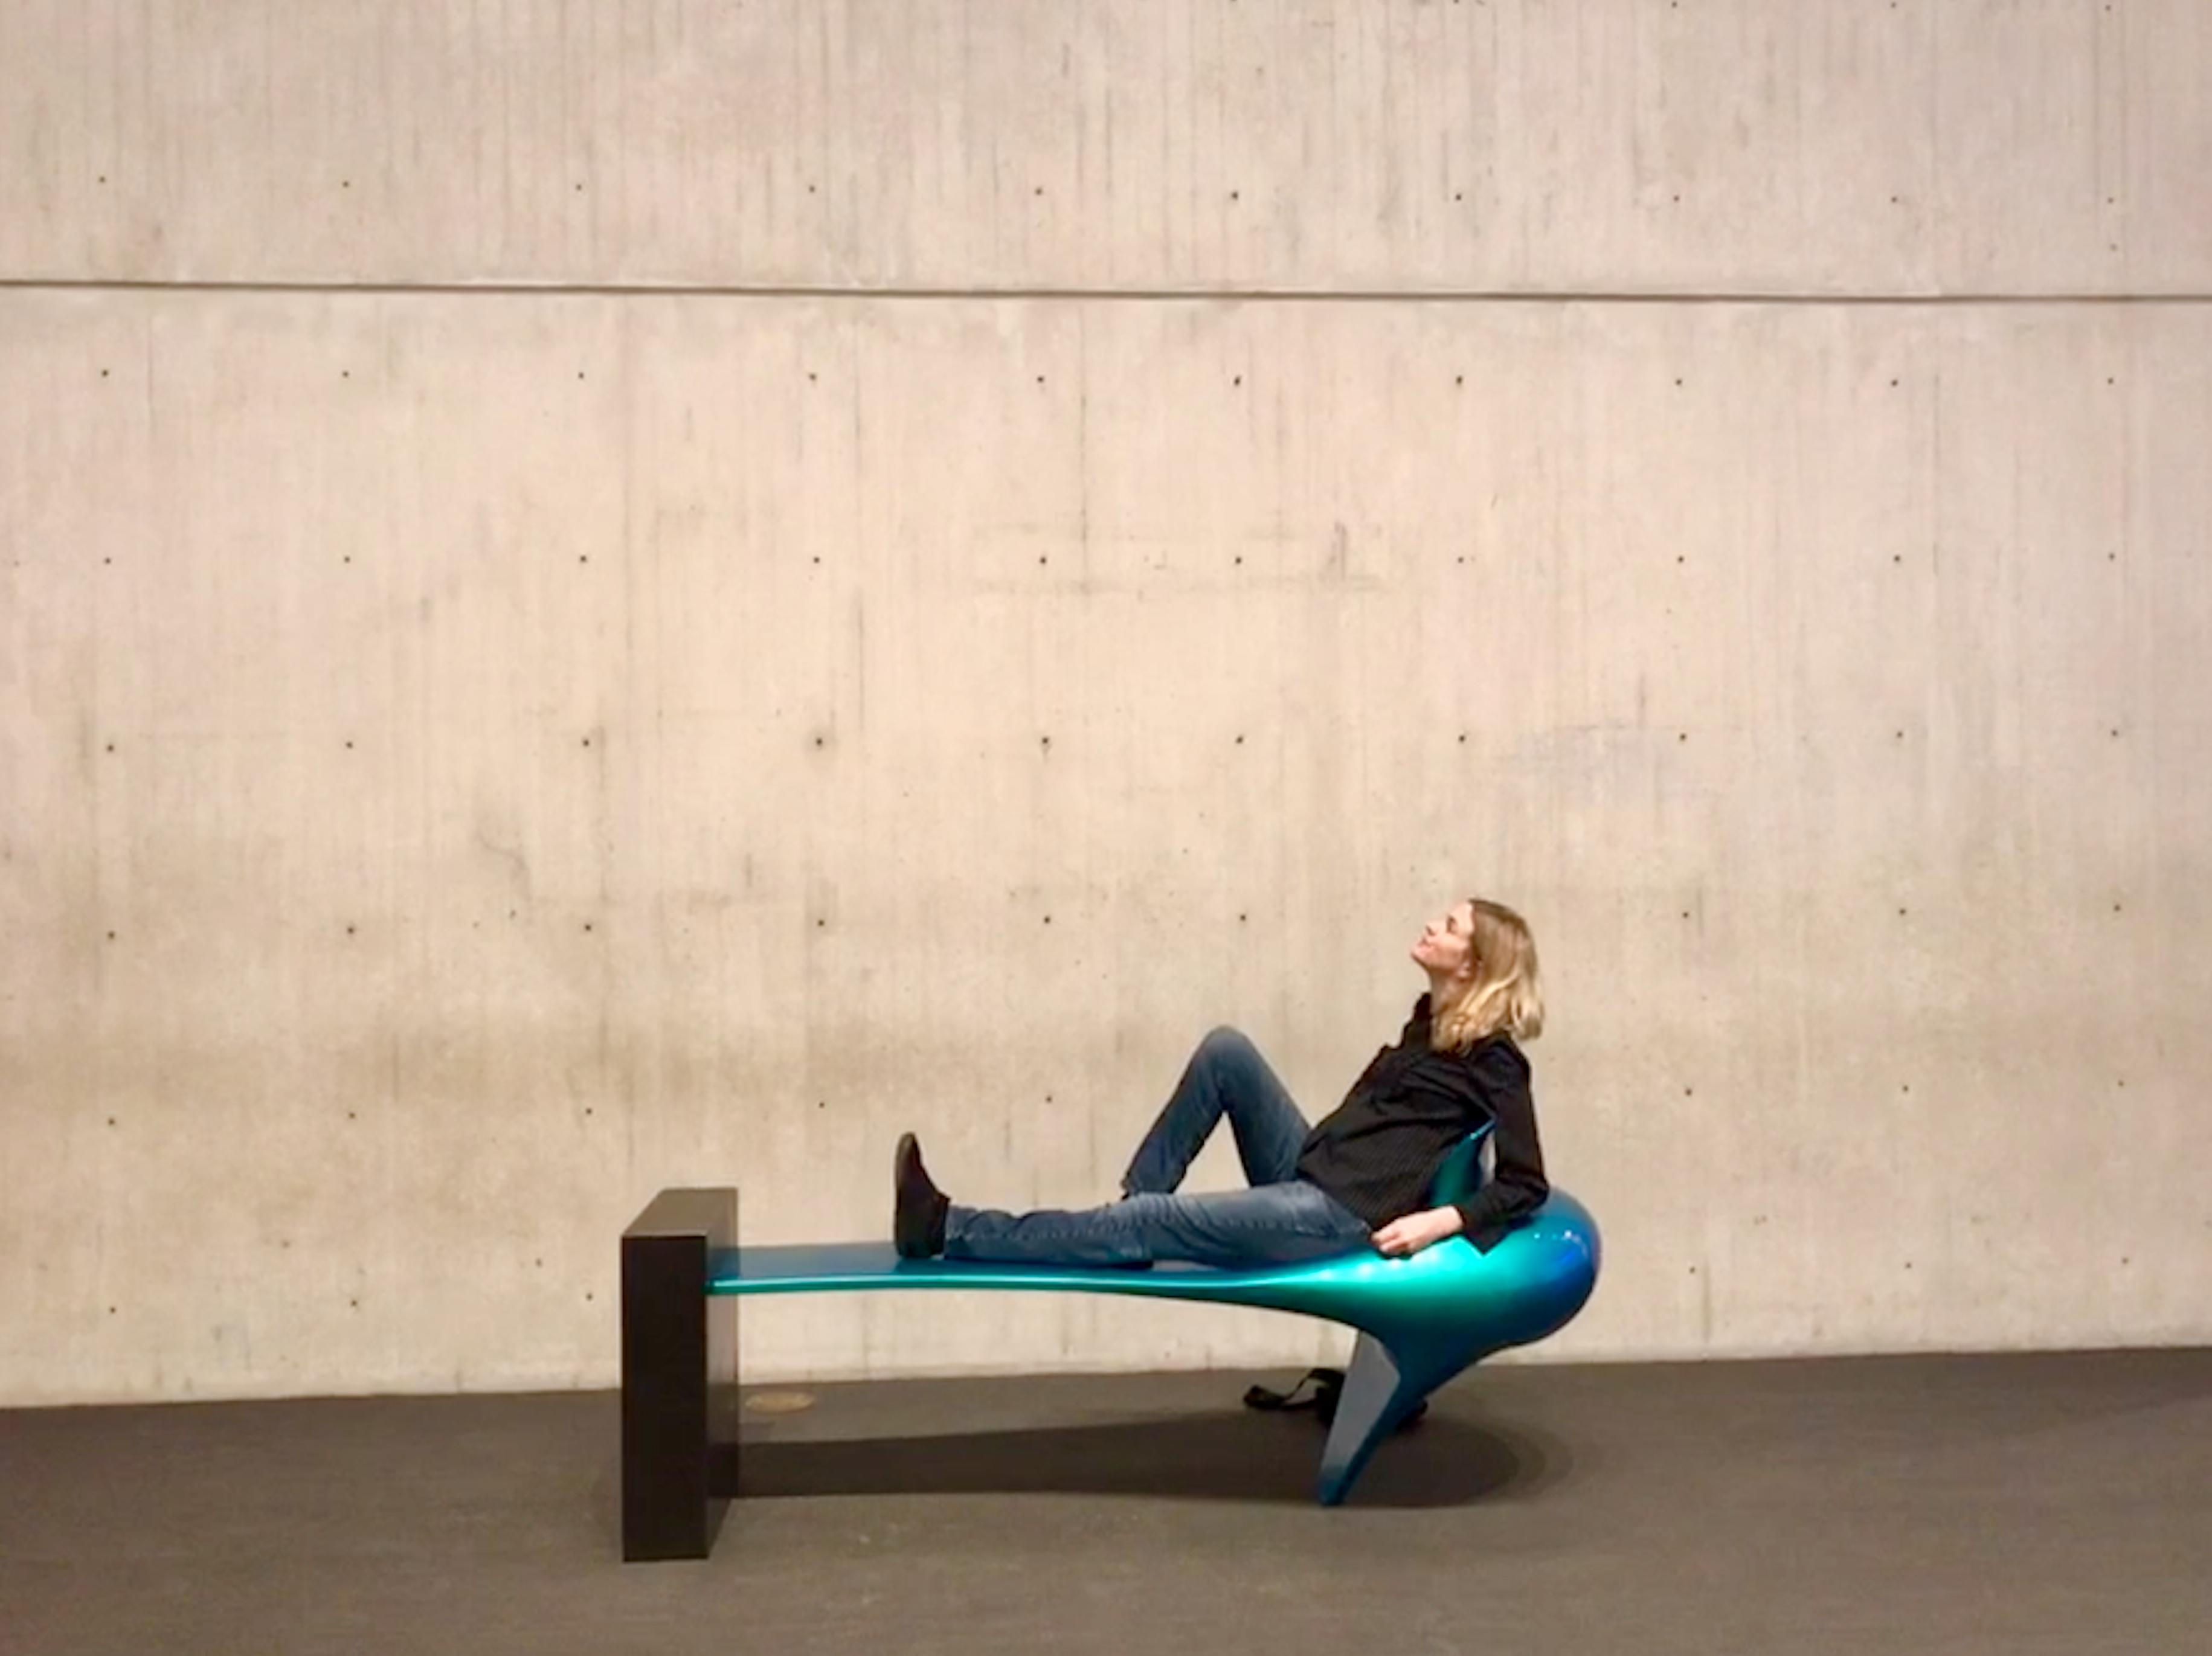 Oni Buchanan at the Museum of Fine Arts, Boston, MA